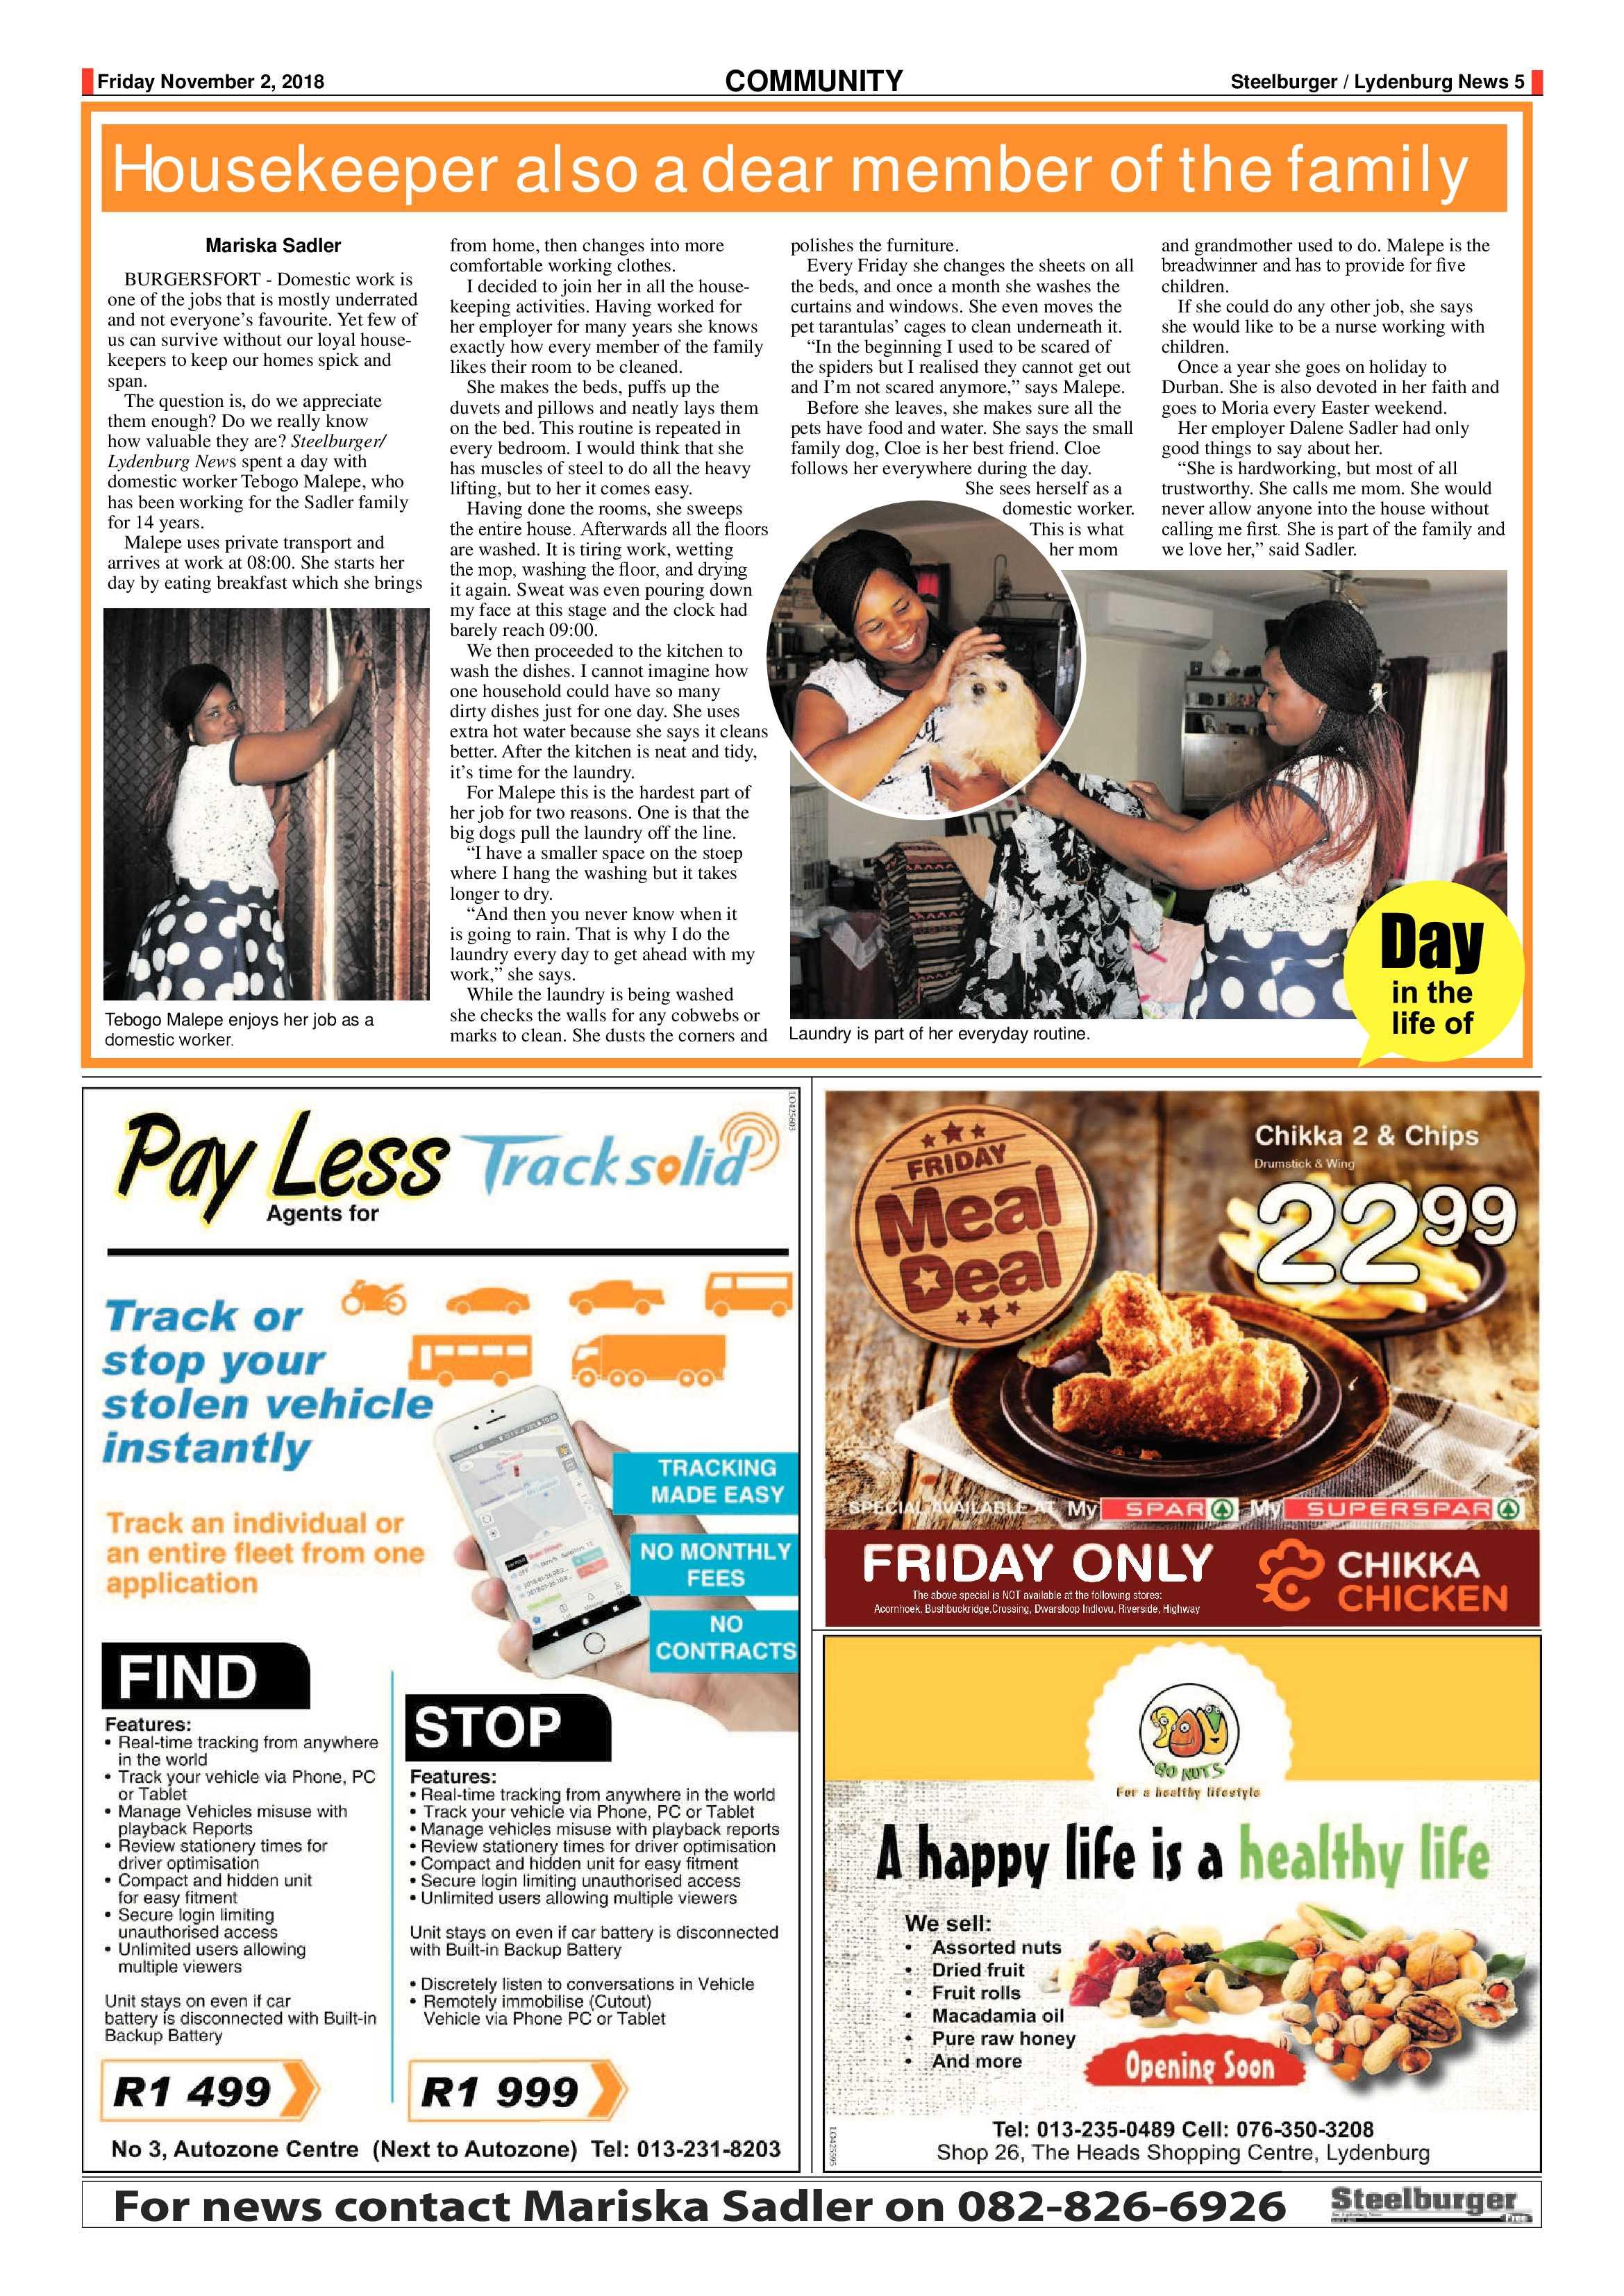 steelburger-news-2-november-2018-epapers-page-5